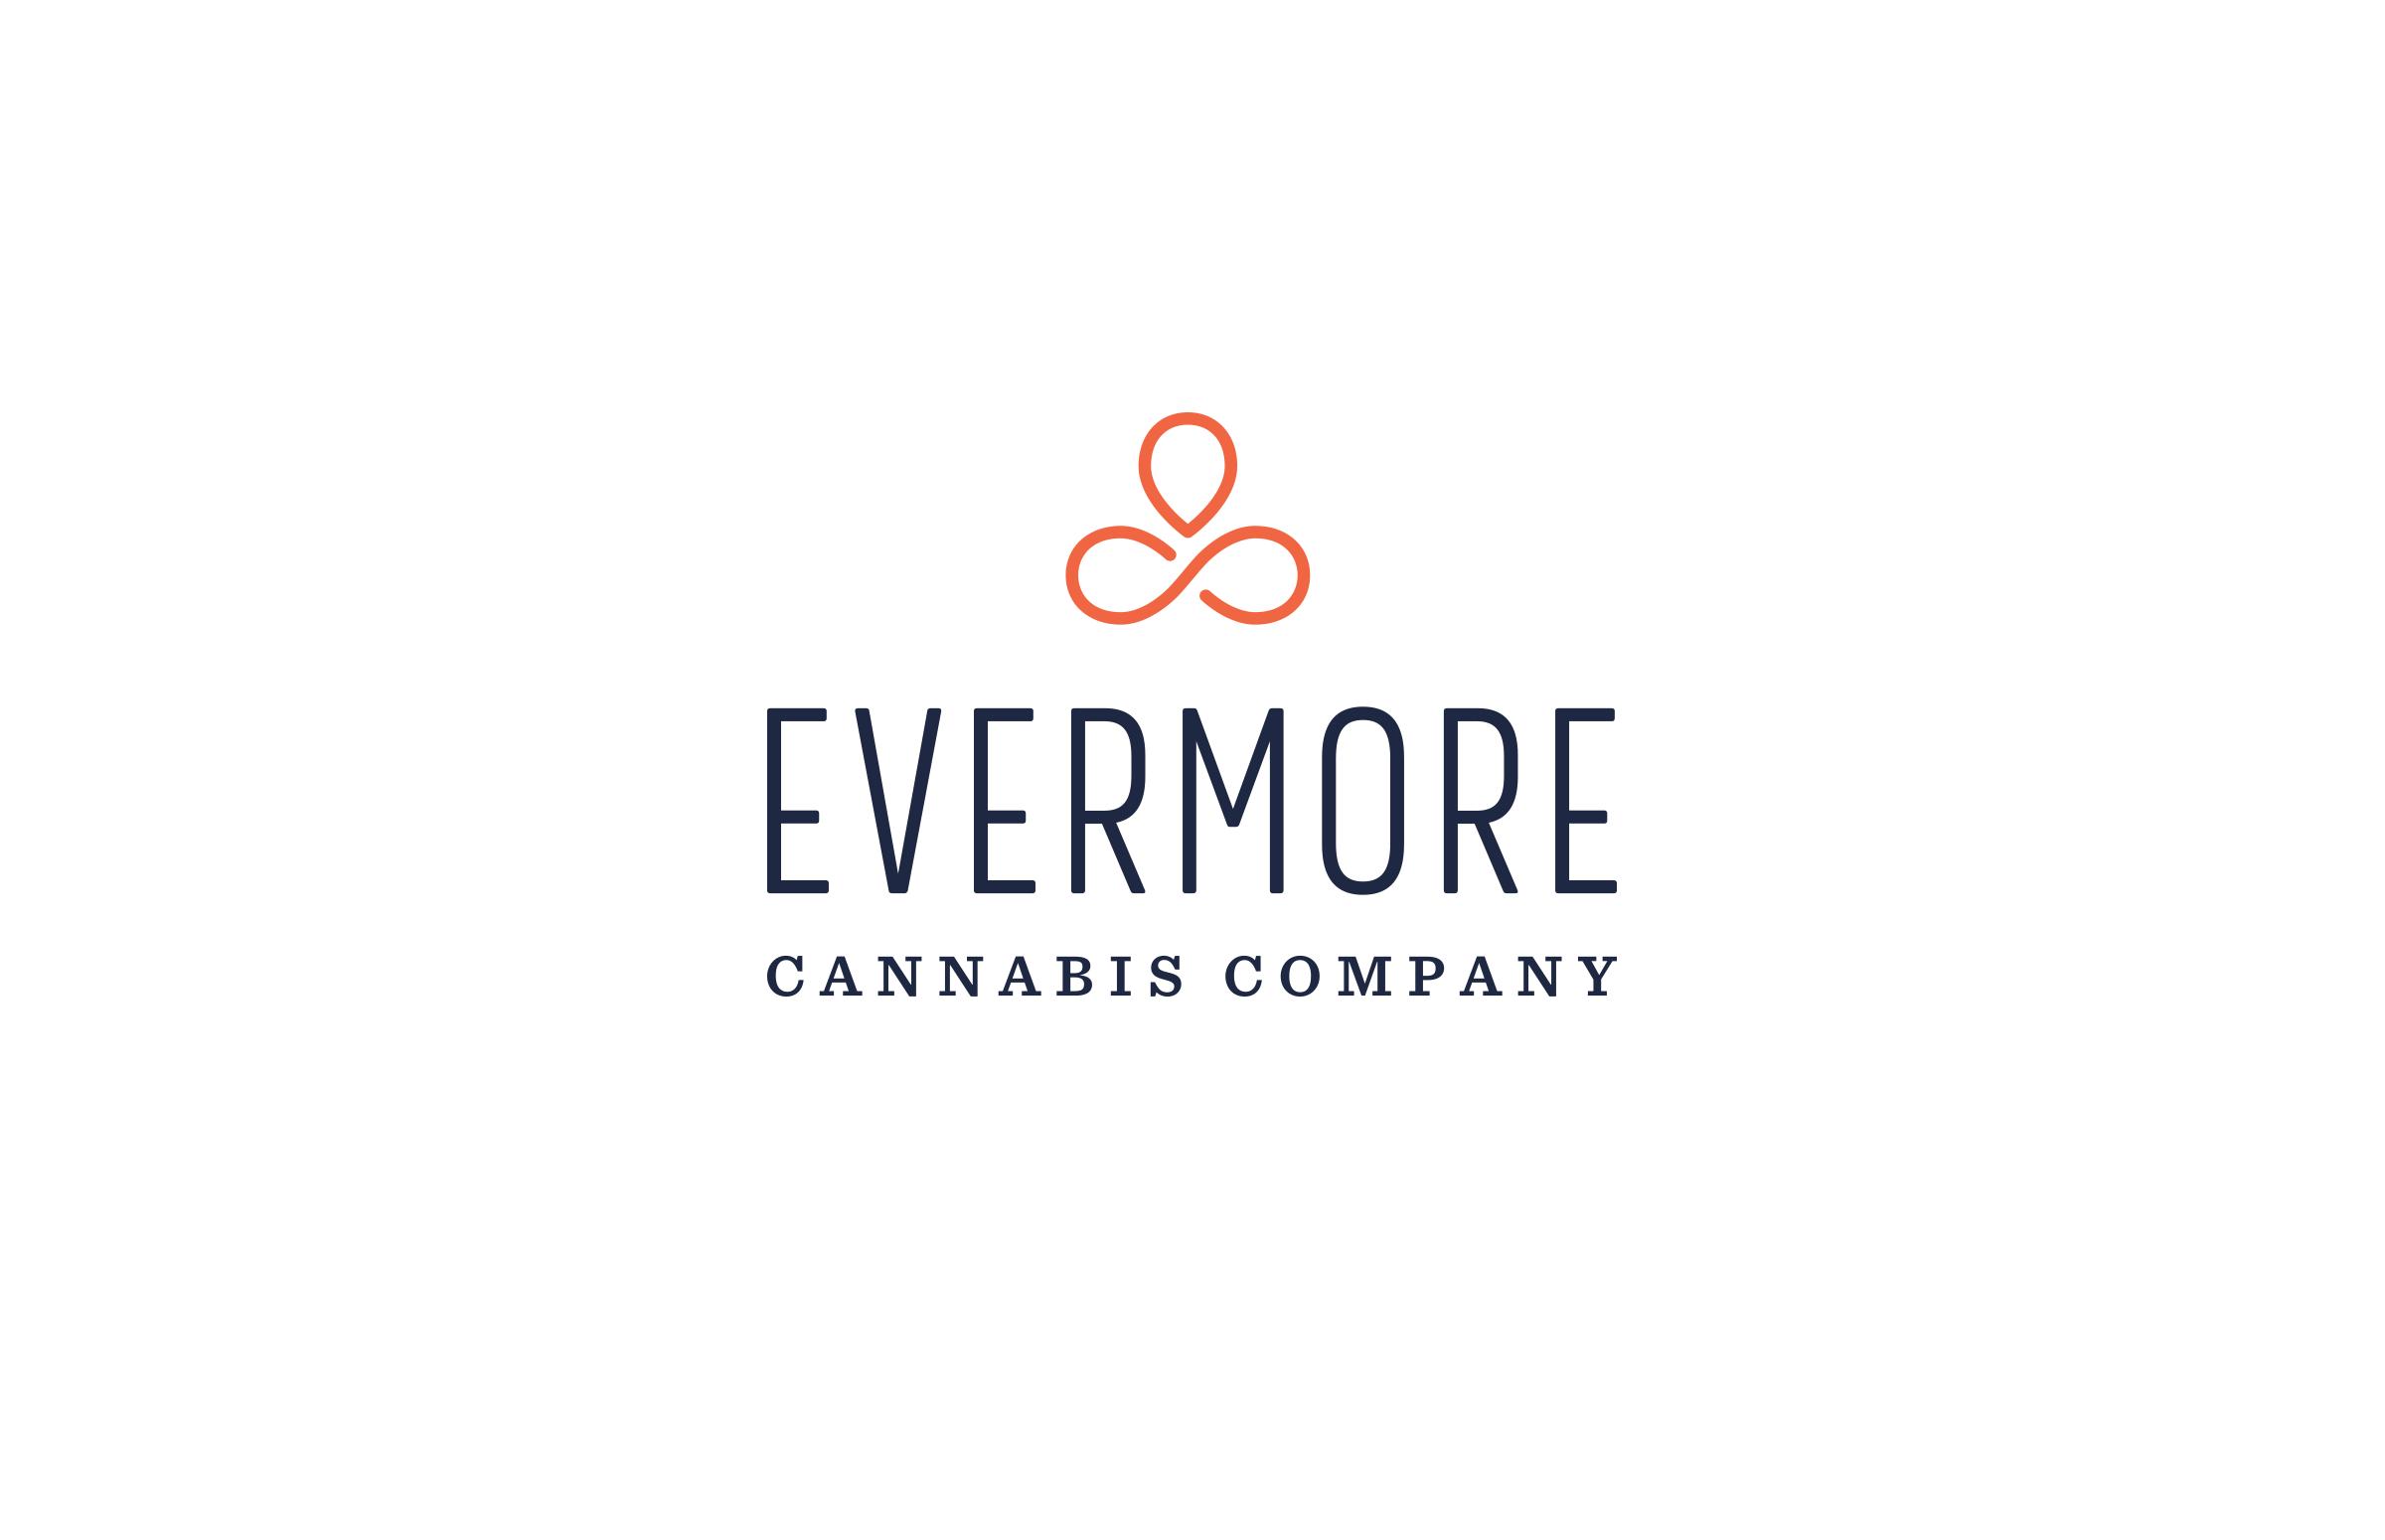 Evermore Cannabis Company: Logo Design